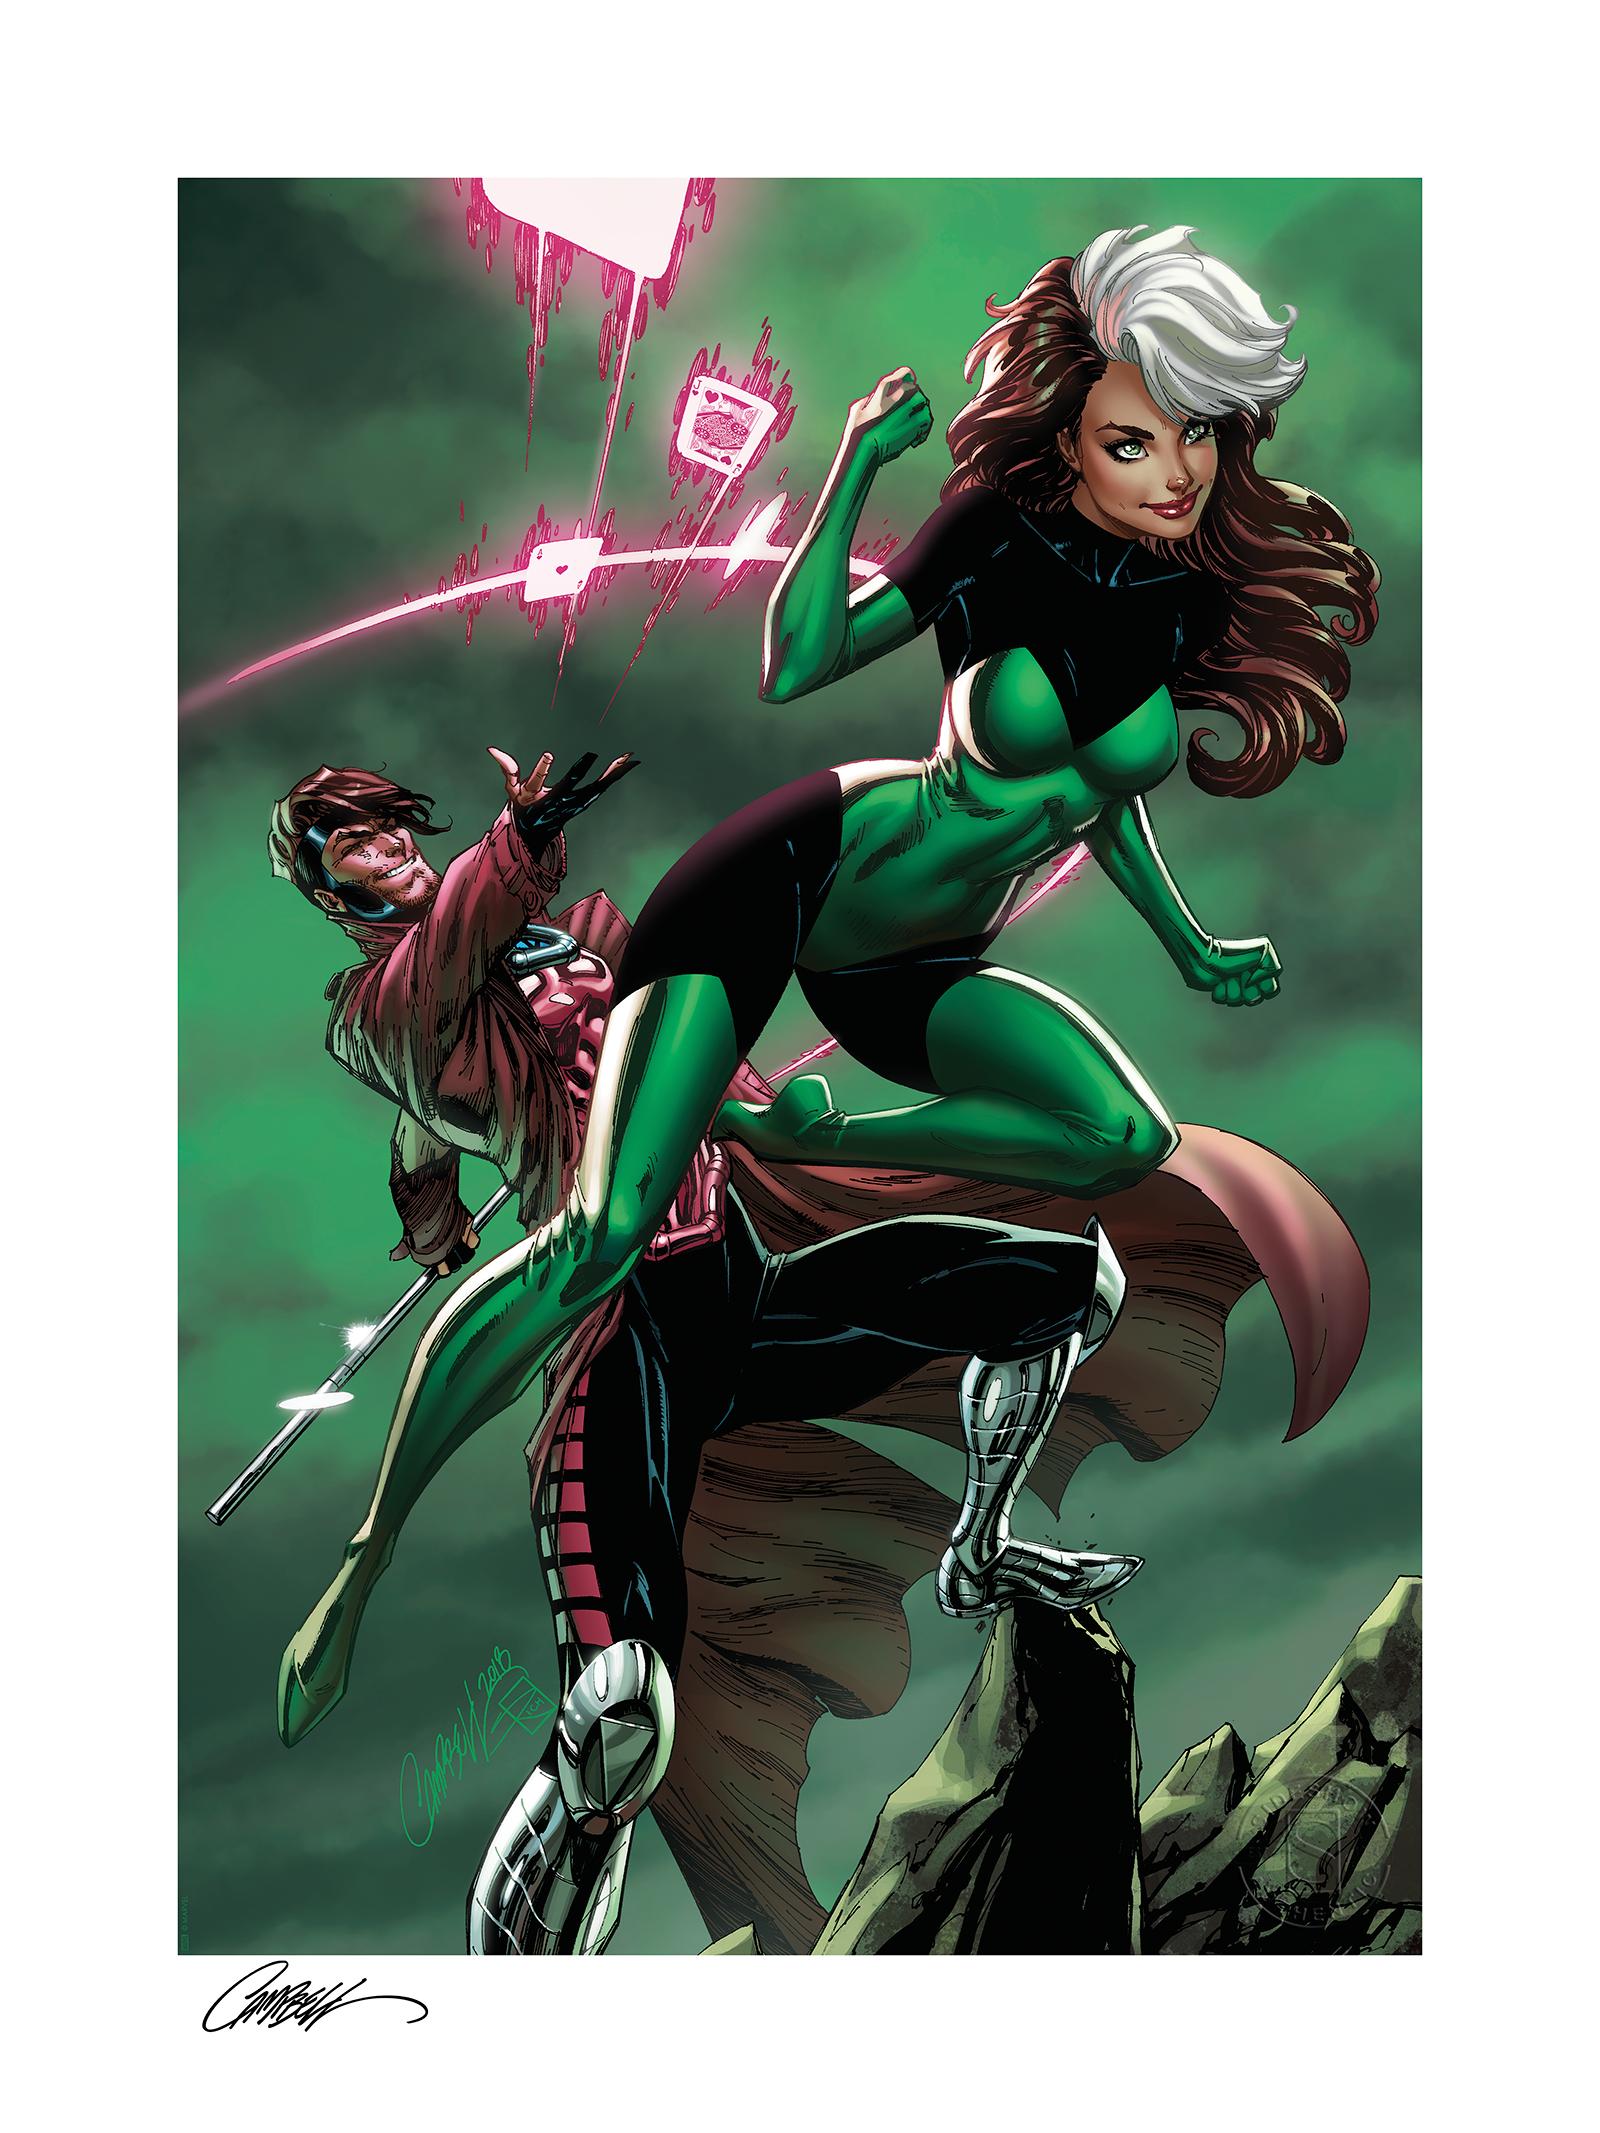 Sideshow Collectibles Uncanny X-Men: Rogue & Gambit Art Print